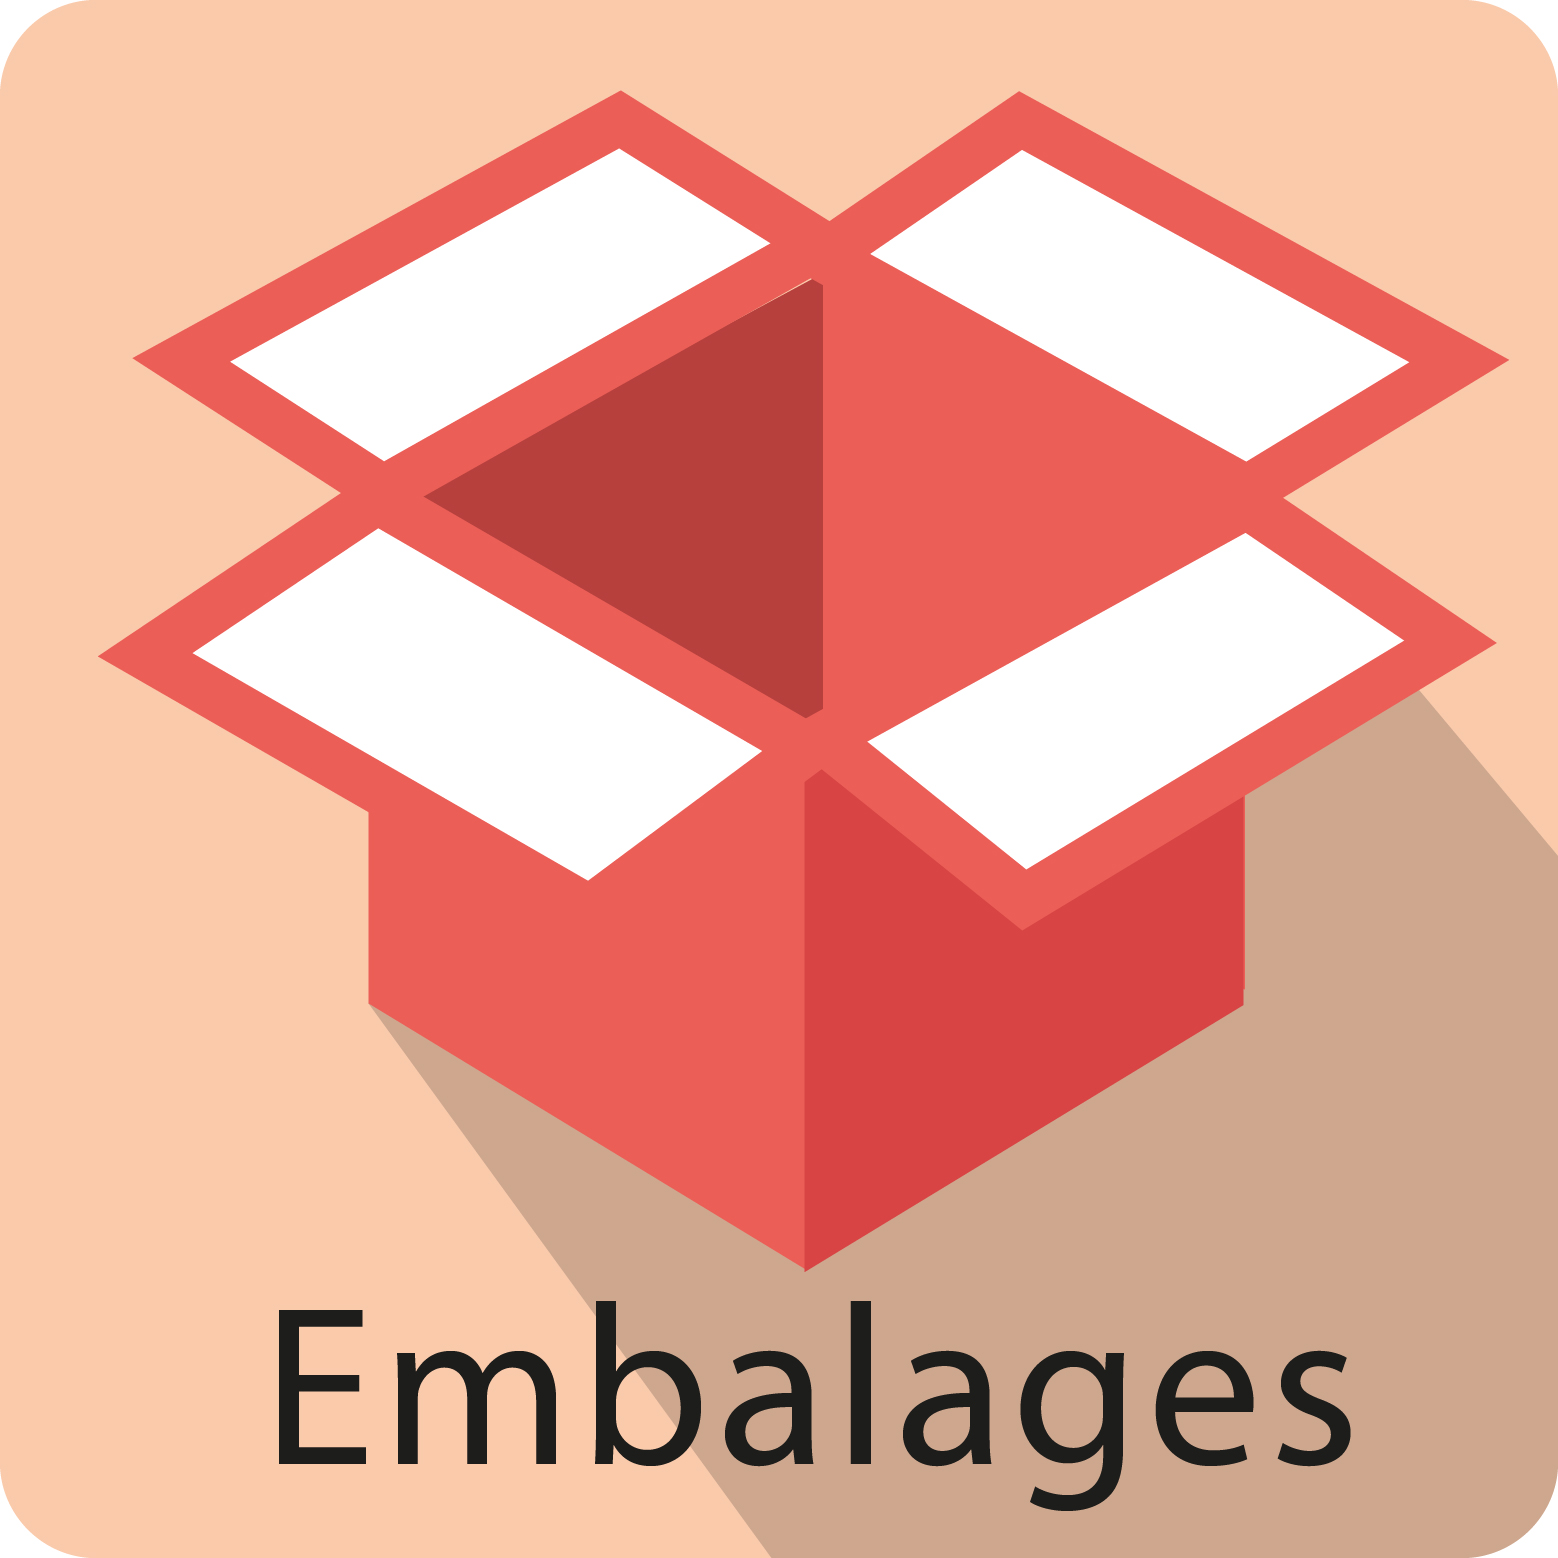 Emballage Packaging